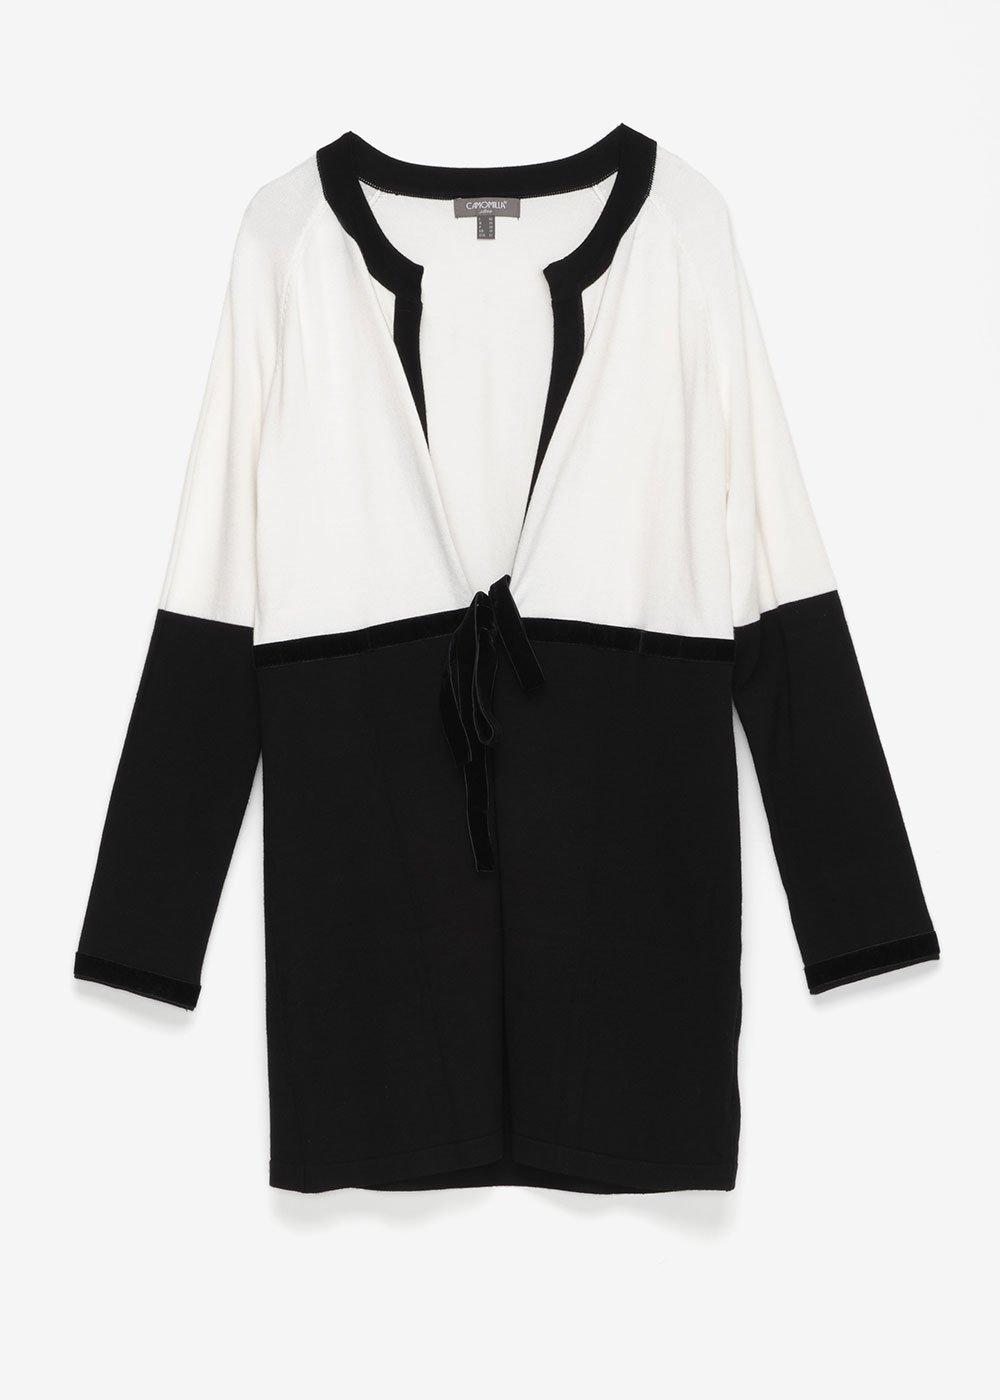 Cardigan bi color Carl - Black / White - Donna